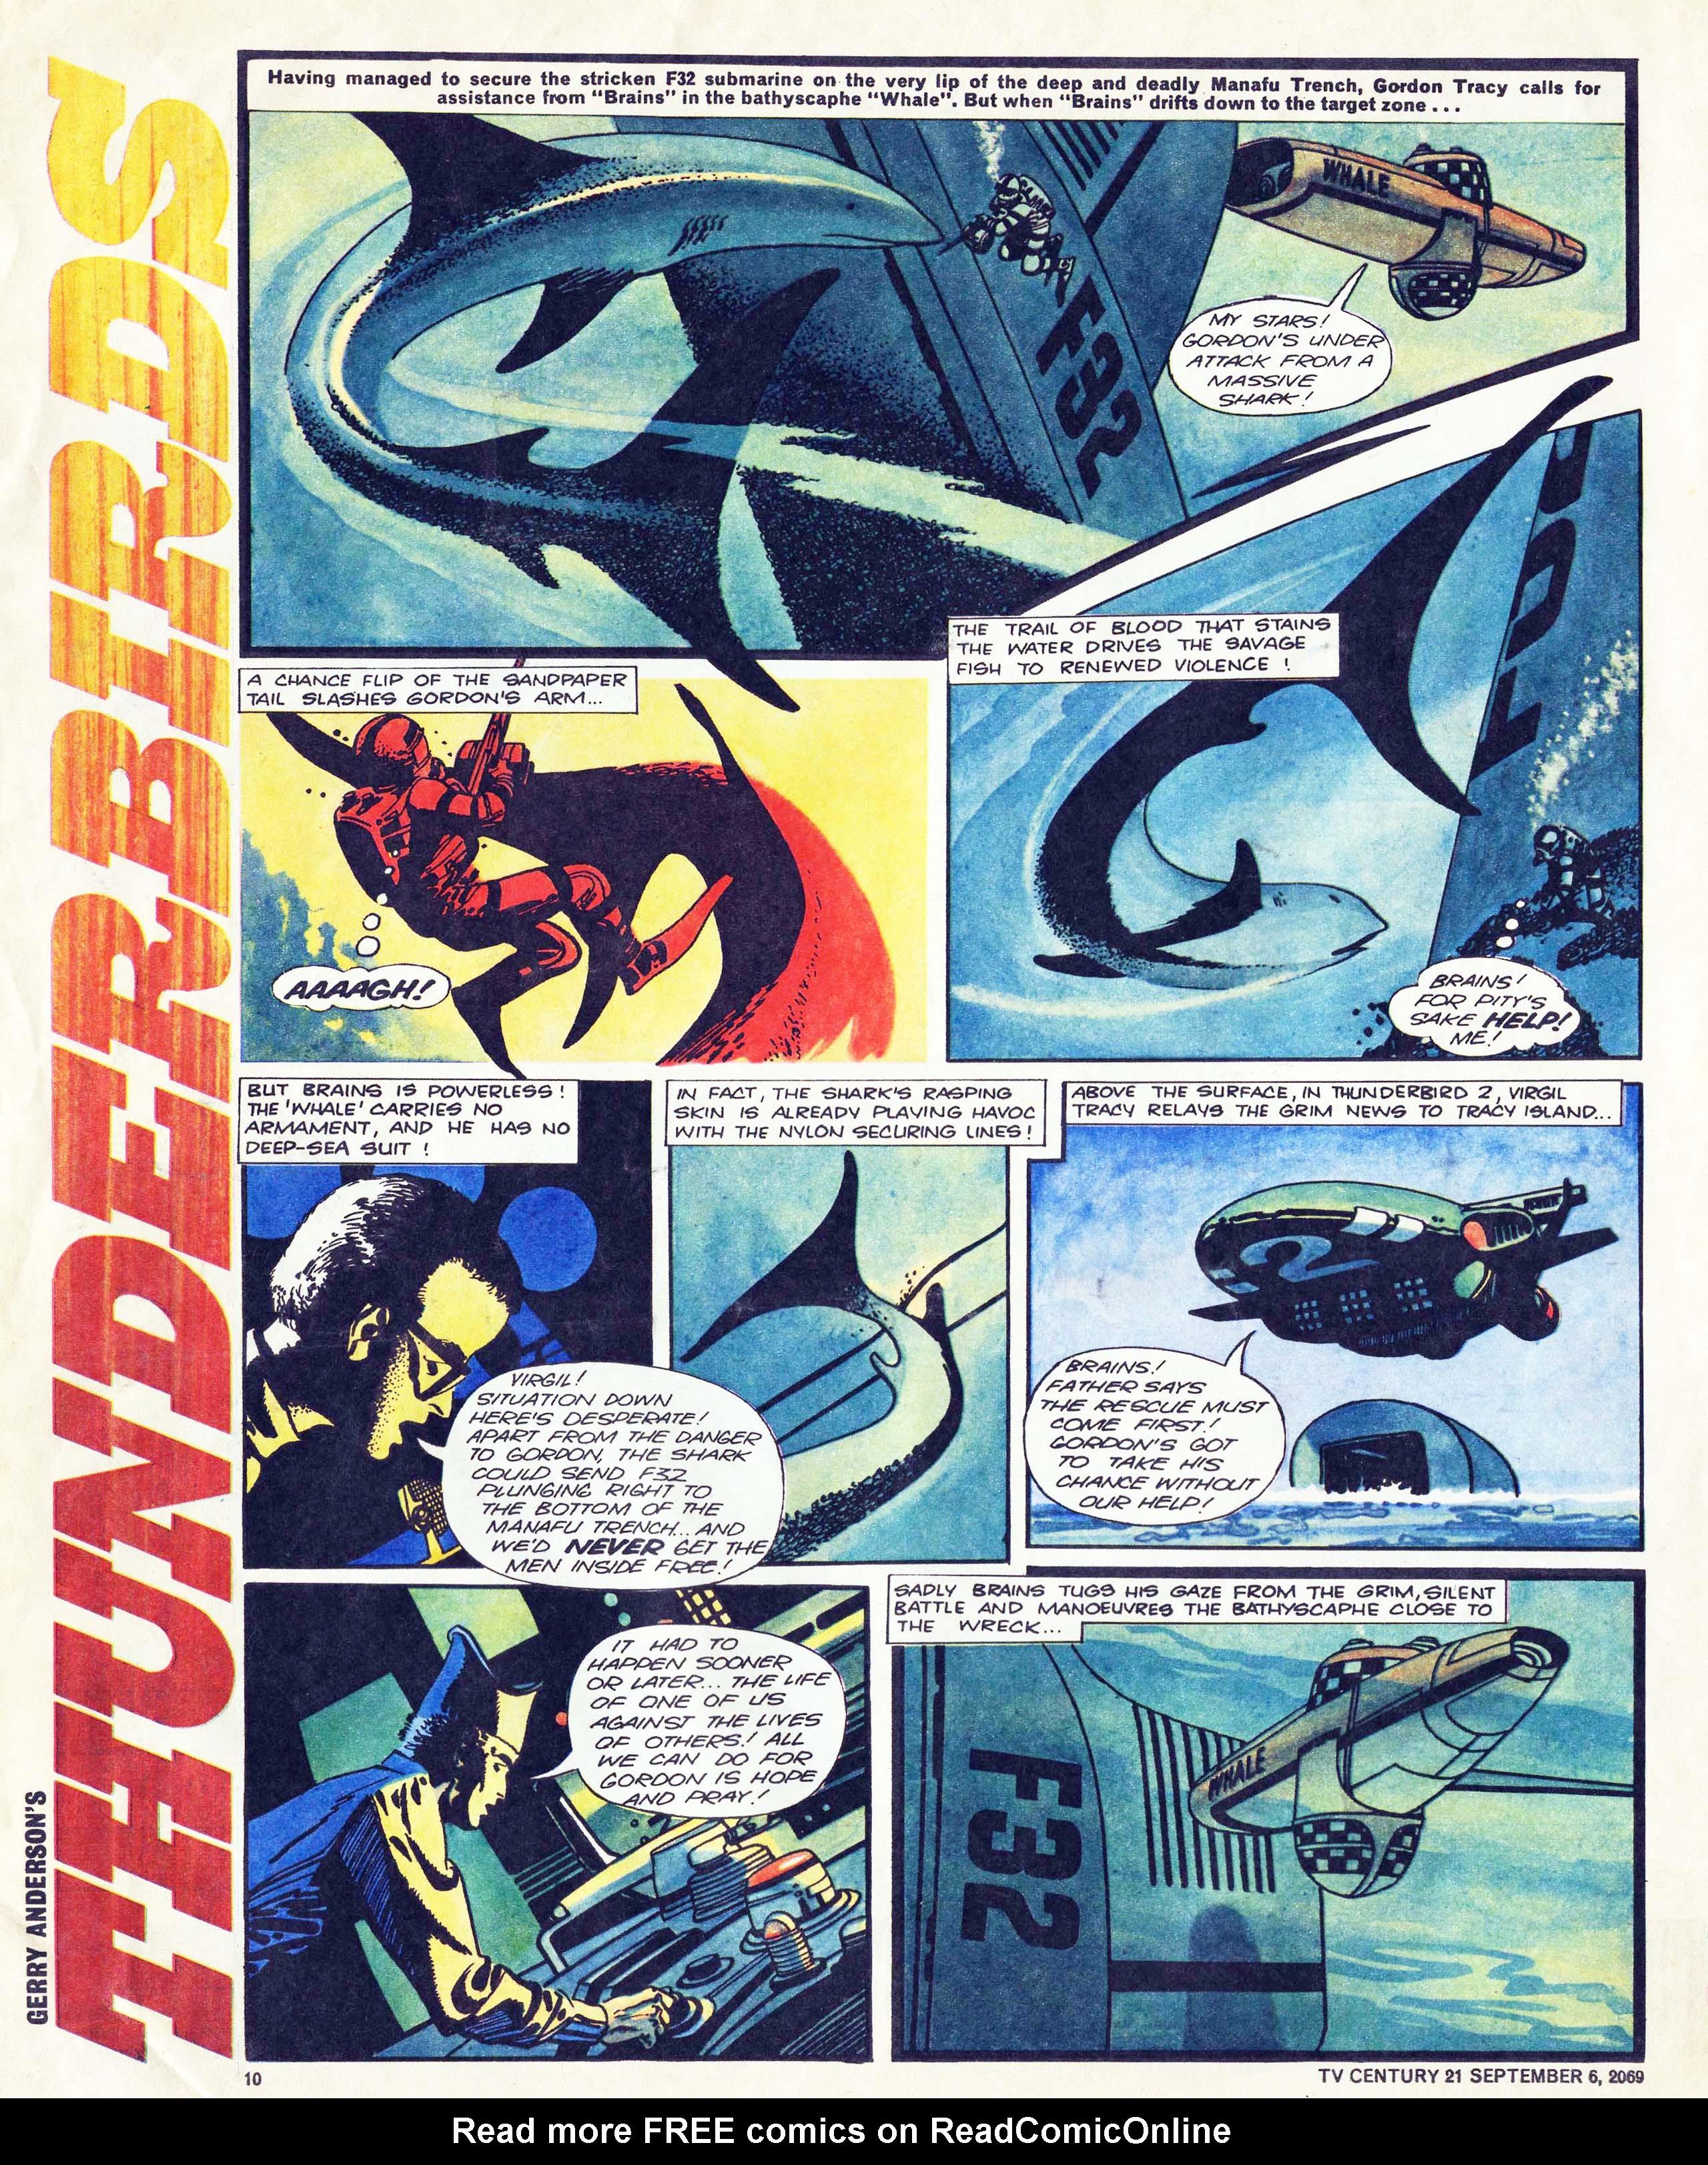 Read online TV Century 21 (TV 21) comic -  Issue #242 - 10